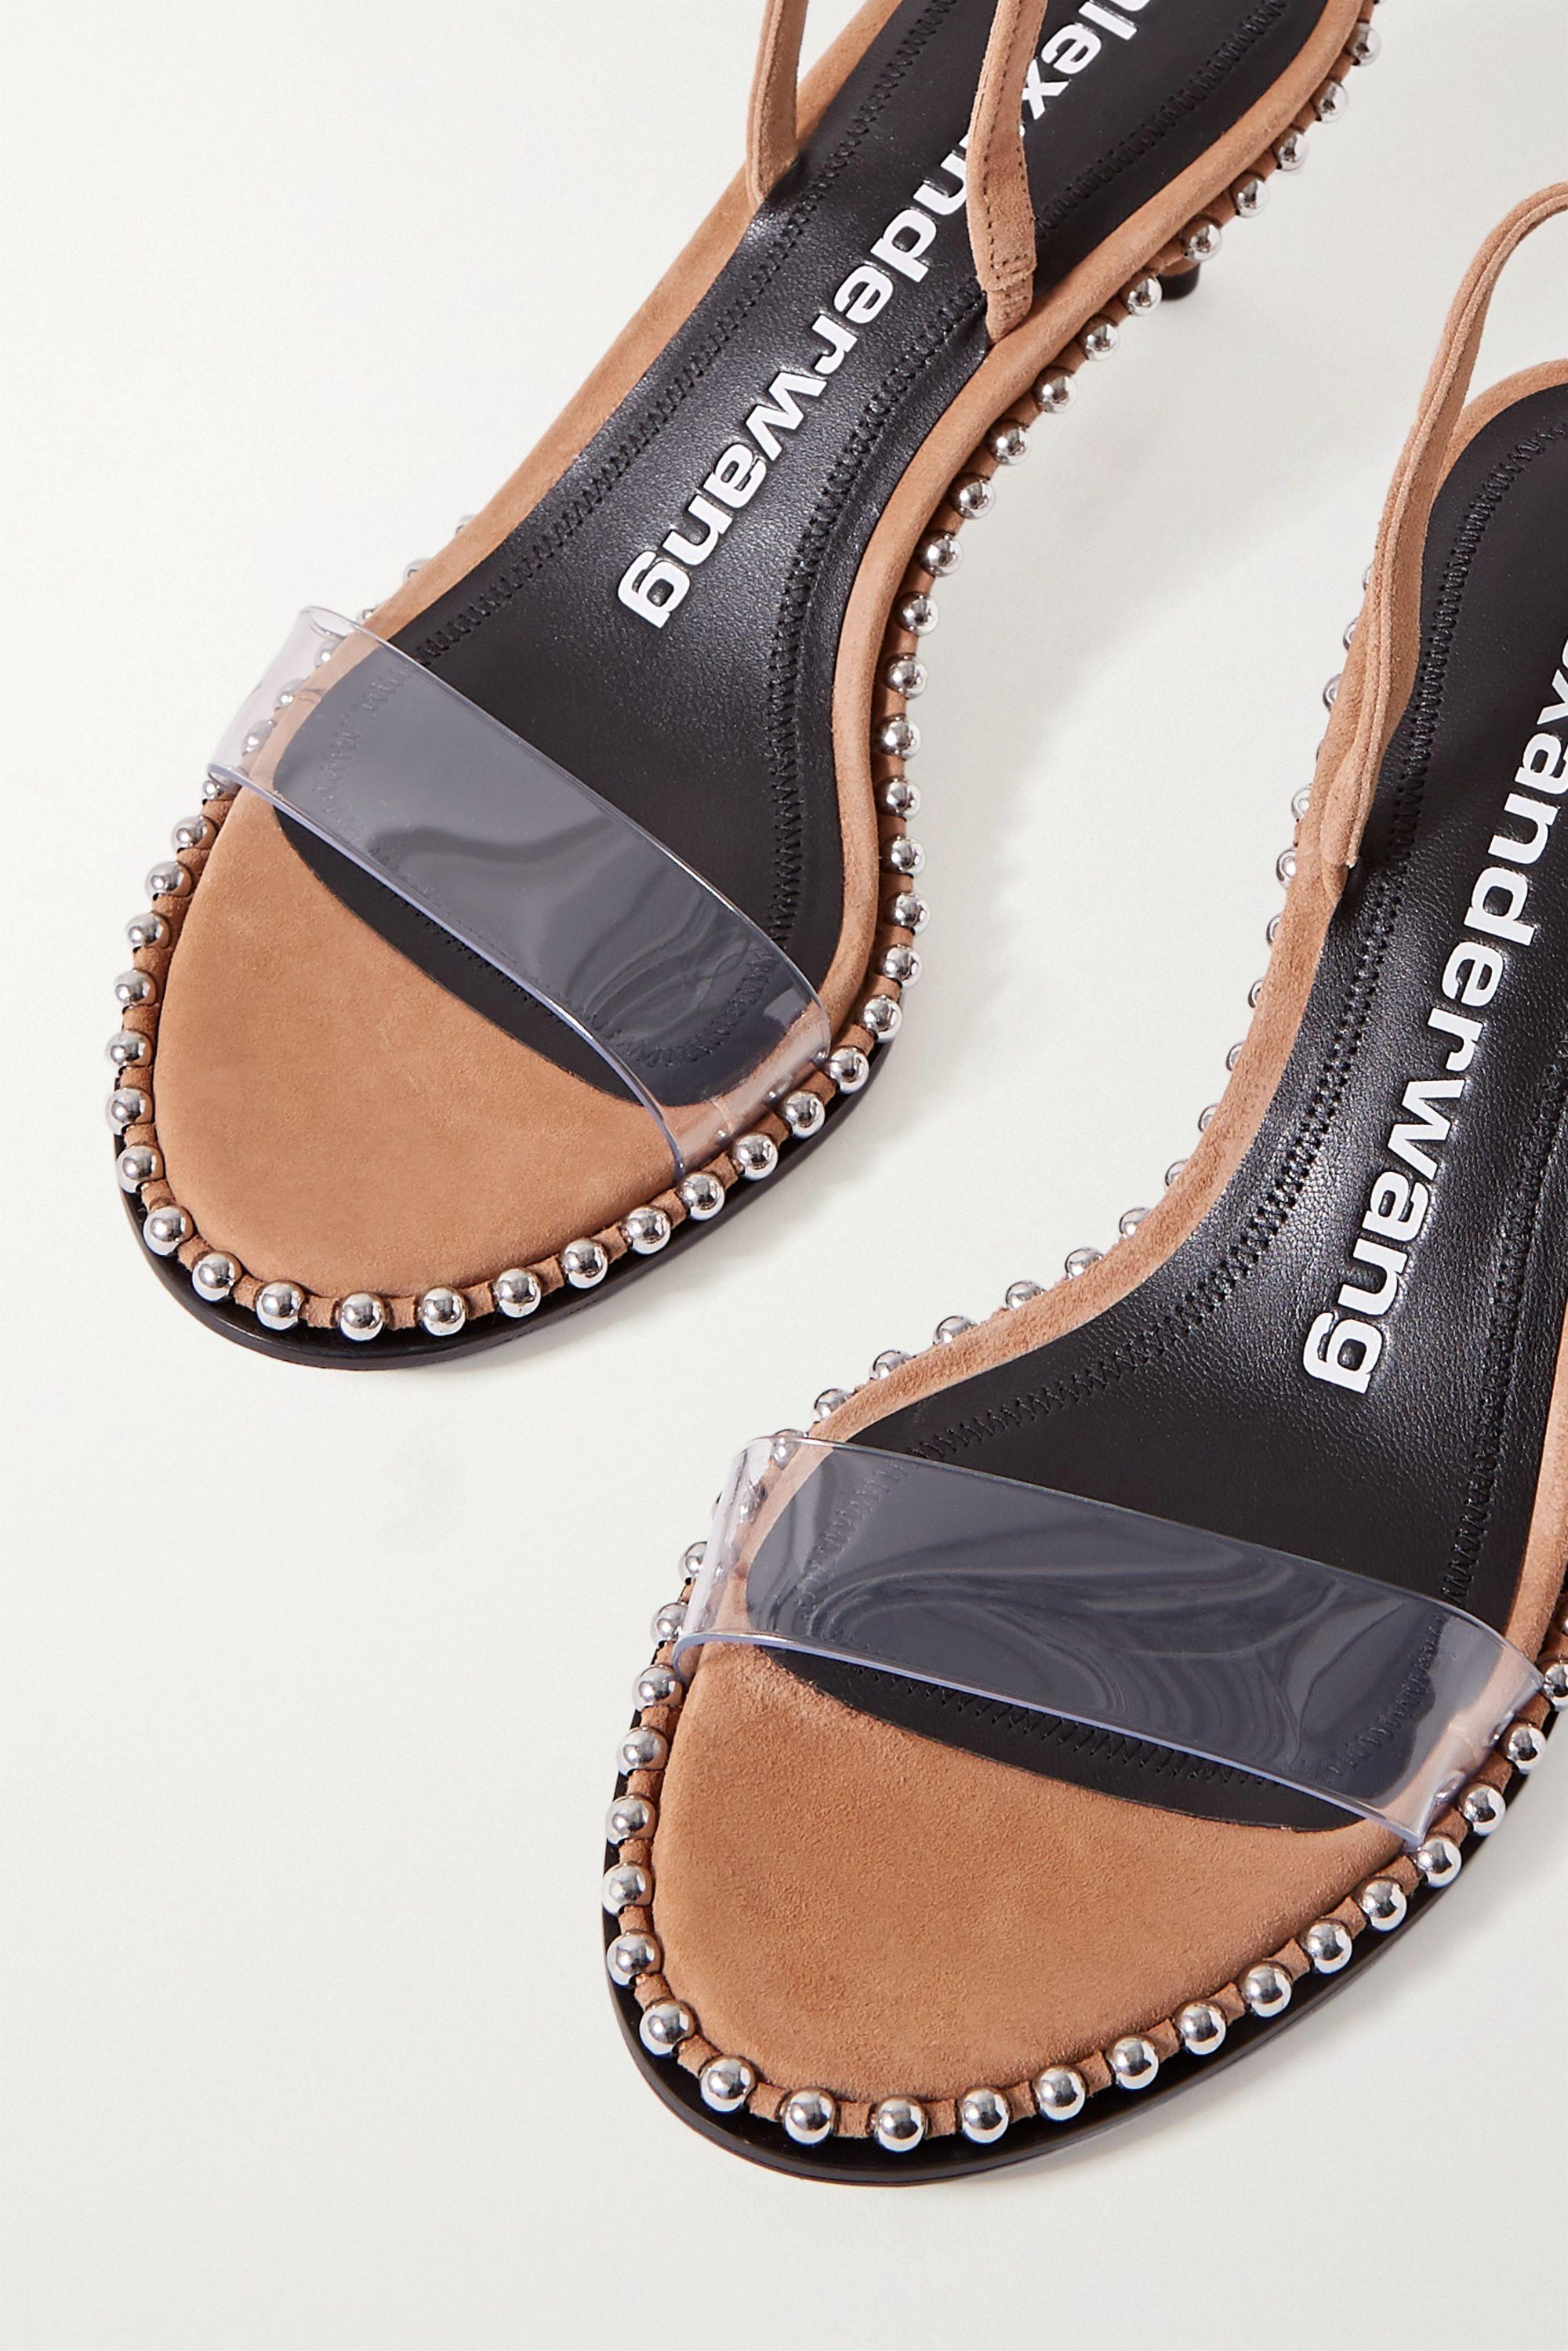 Alexander Wang Nova Low studded suede and PVC slingback sandals